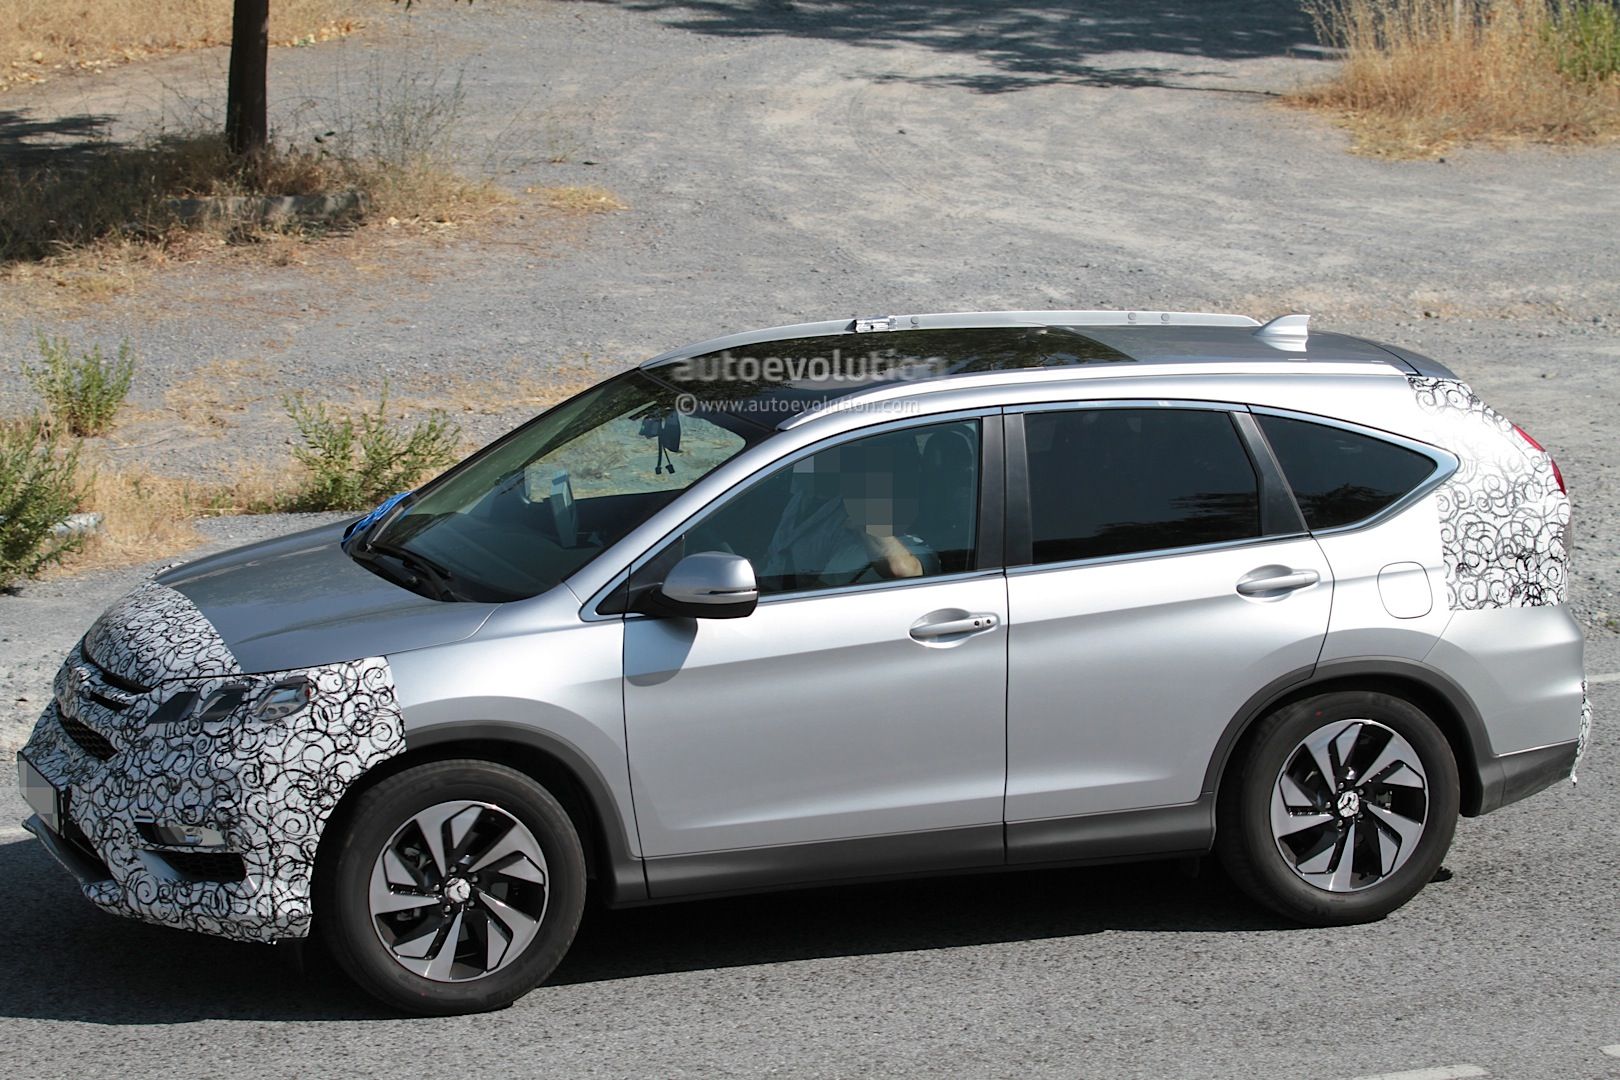 2016 Honda CR-V Facelift Spied While Testing - autoevolution